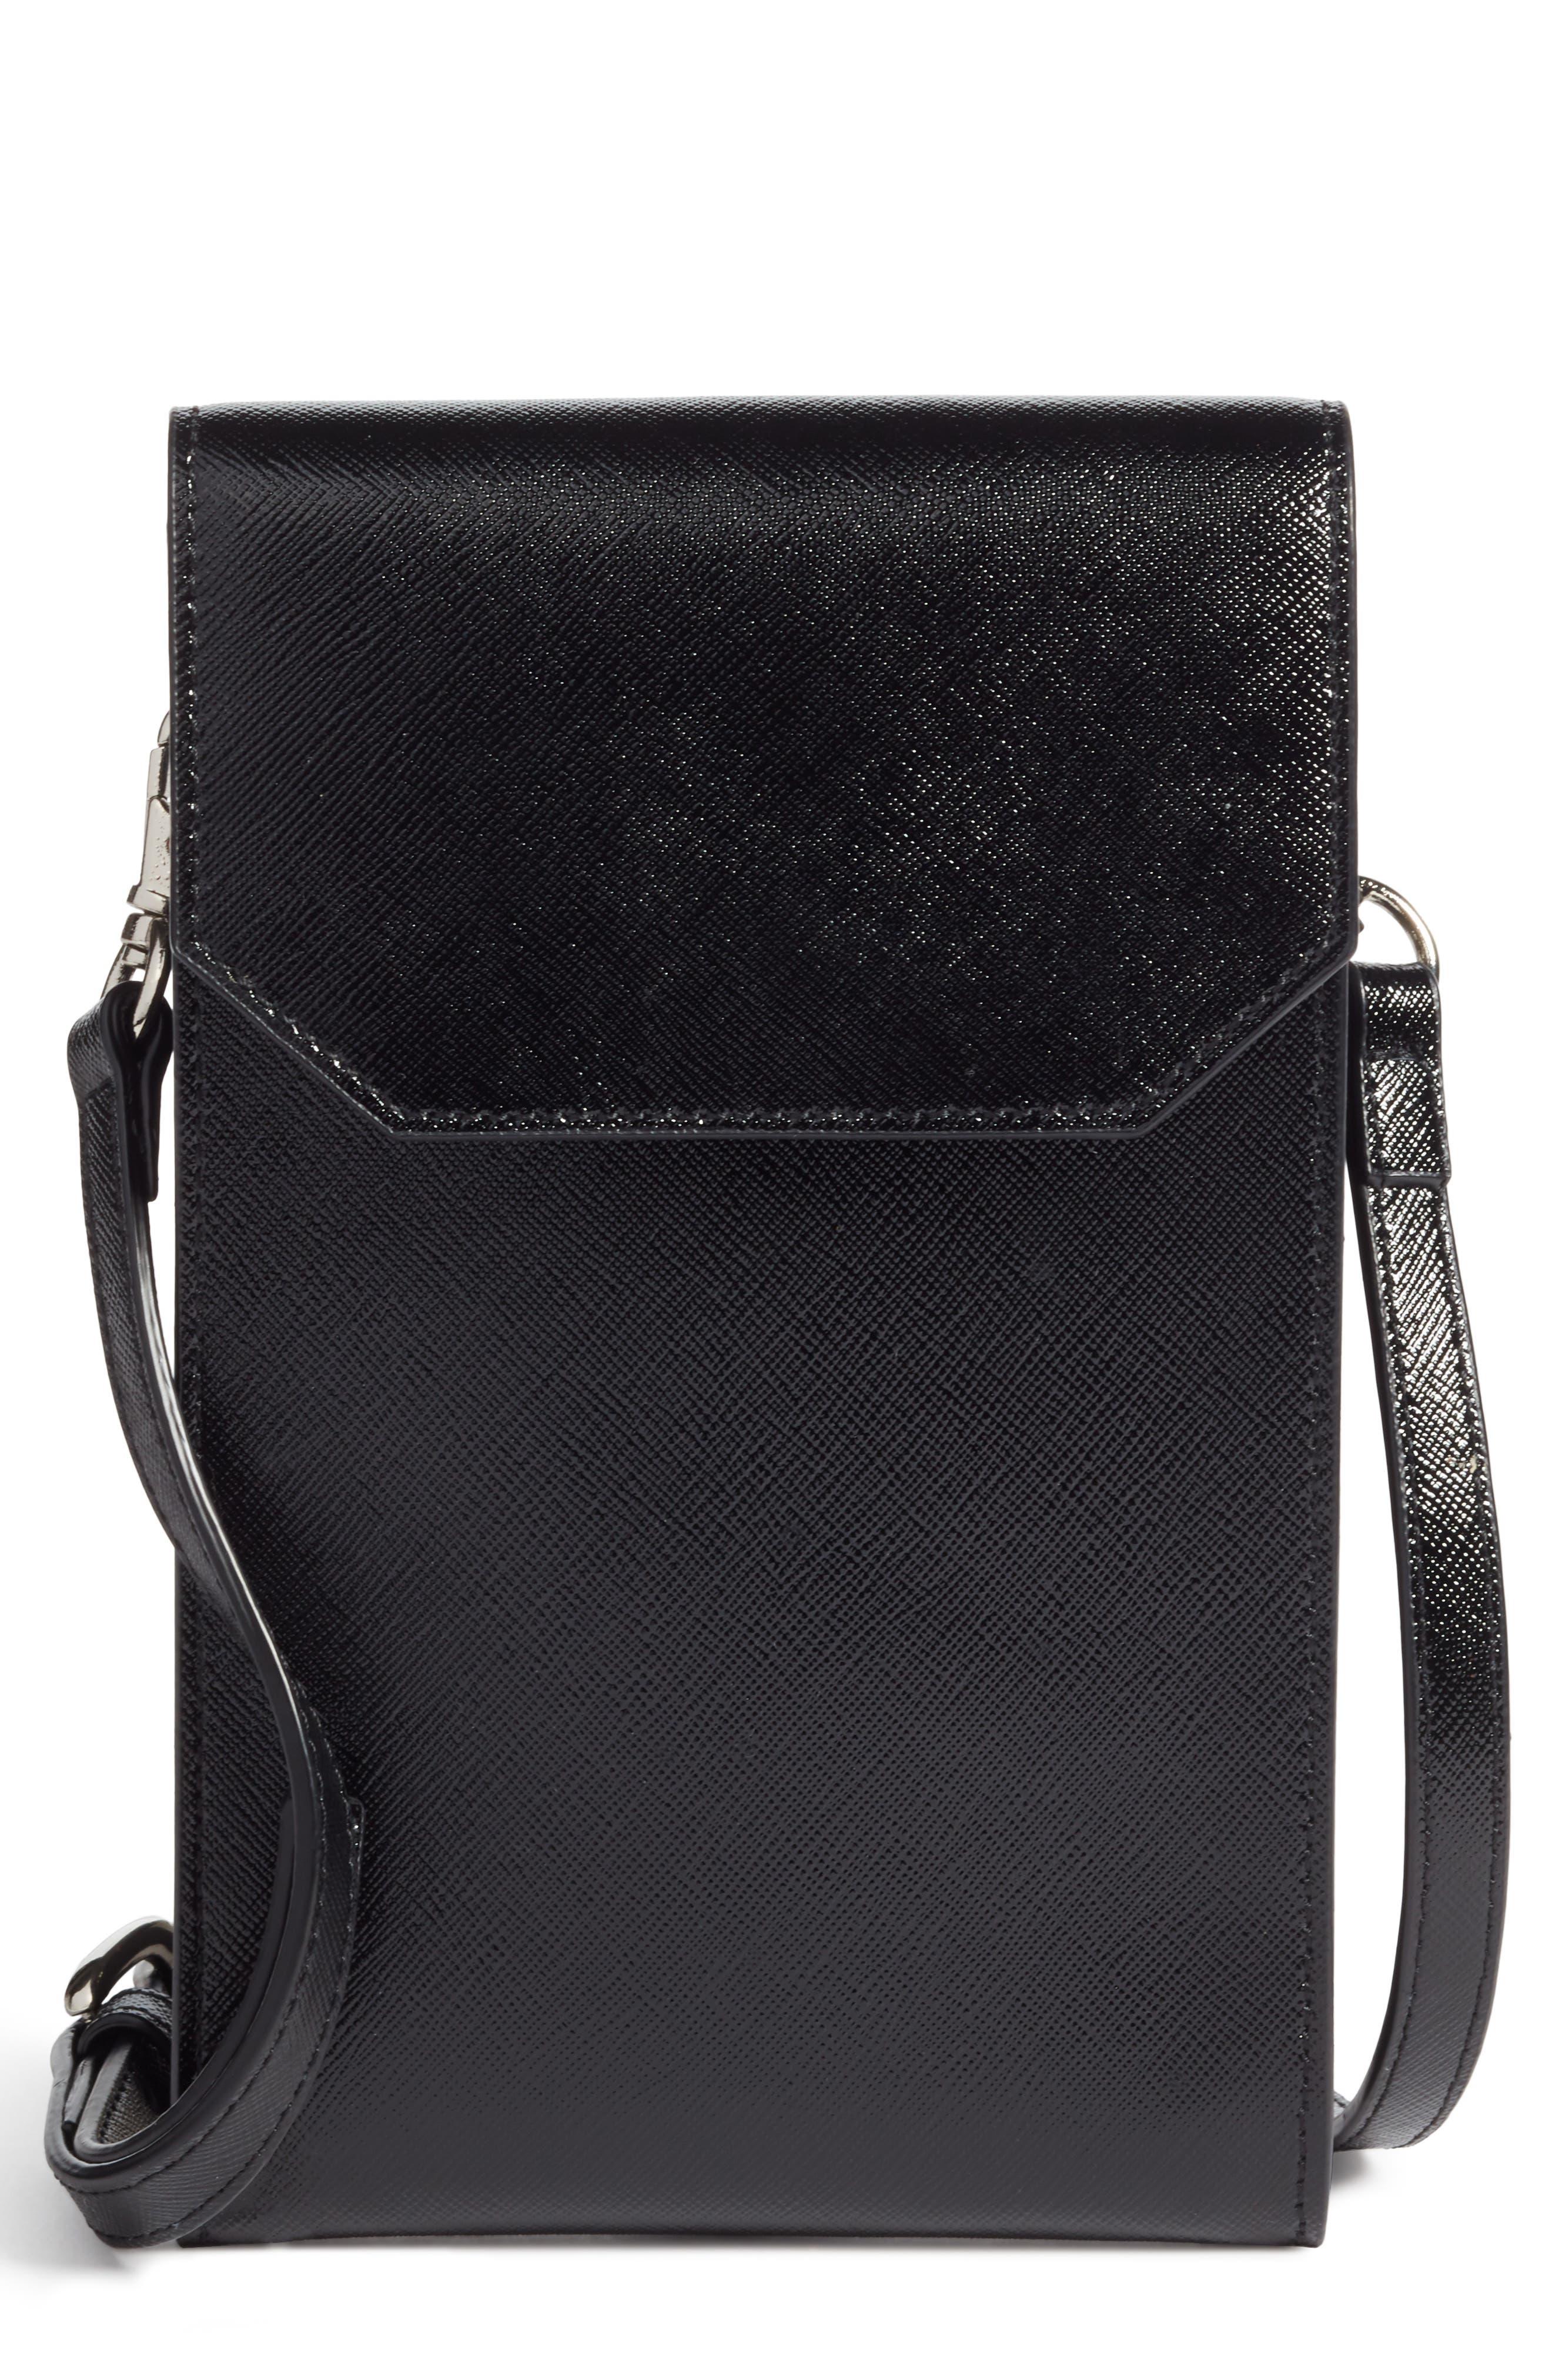 Leather Phone Crossbody Bag,                             Main thumbnail 1, color,                             001